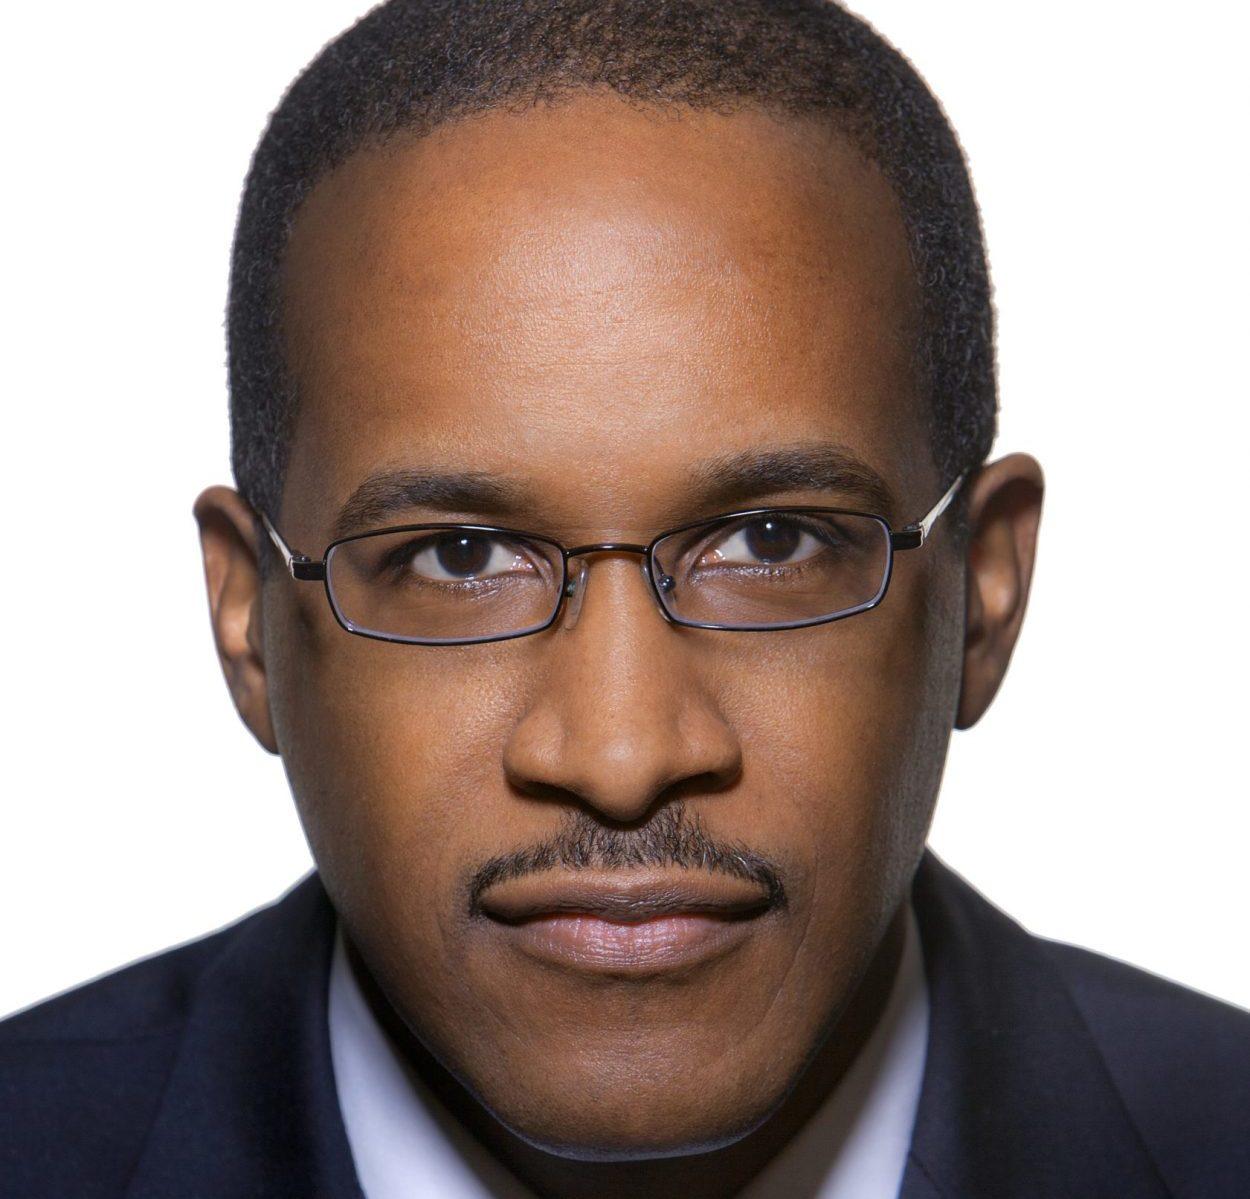 Dr. Walter M. Kimbrough, president of Dillard University